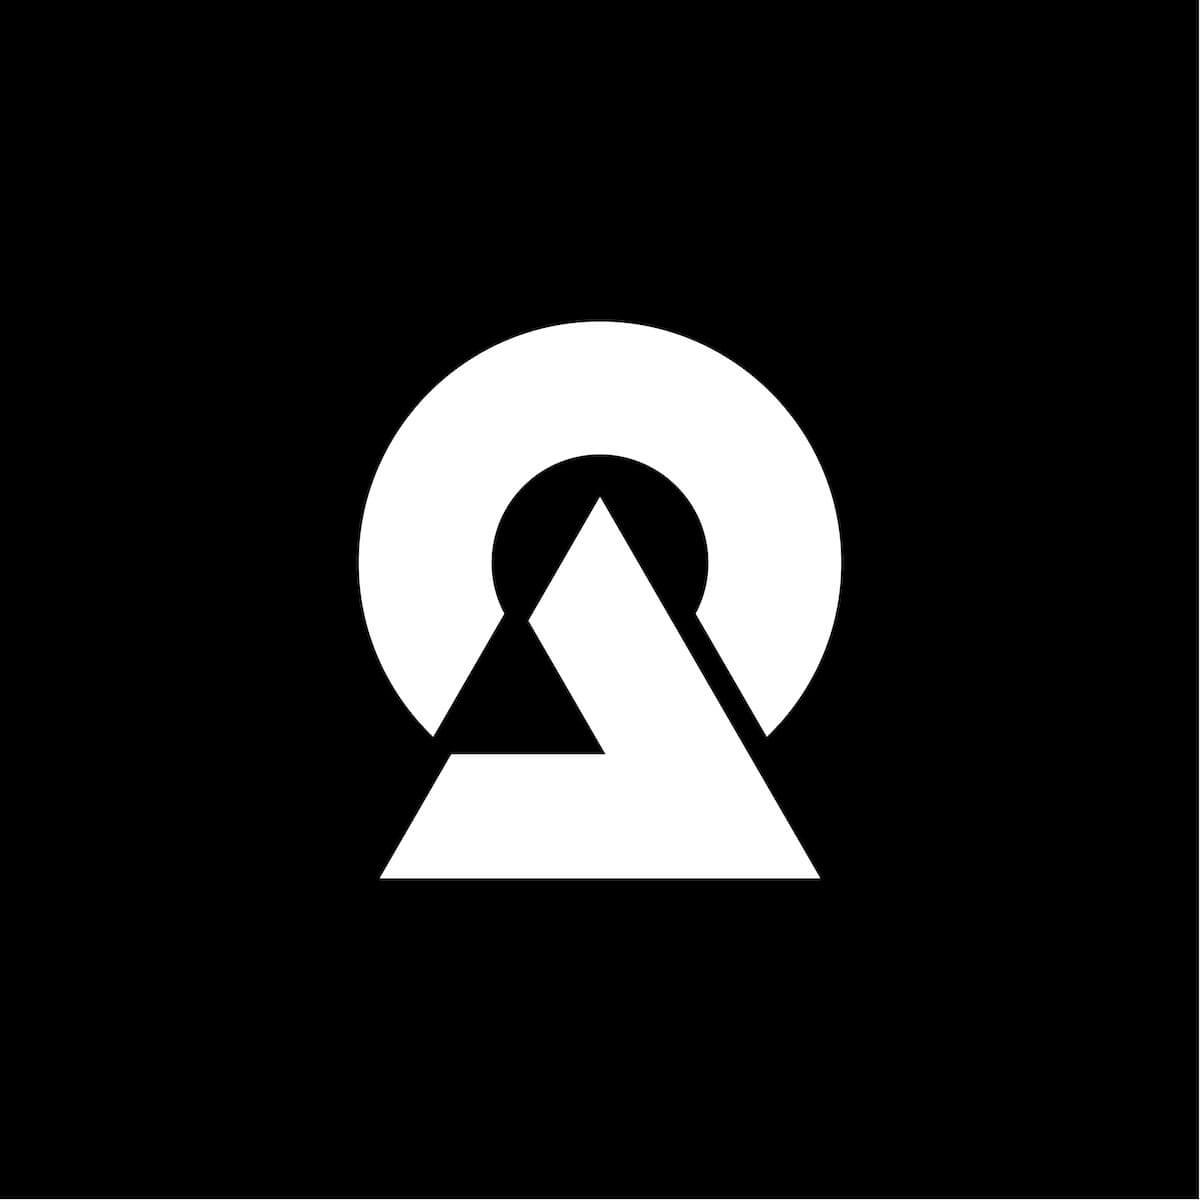 DUSTCELL、専門学校HAL新CMソング「命の行方」MV公開 - Real Sound ...